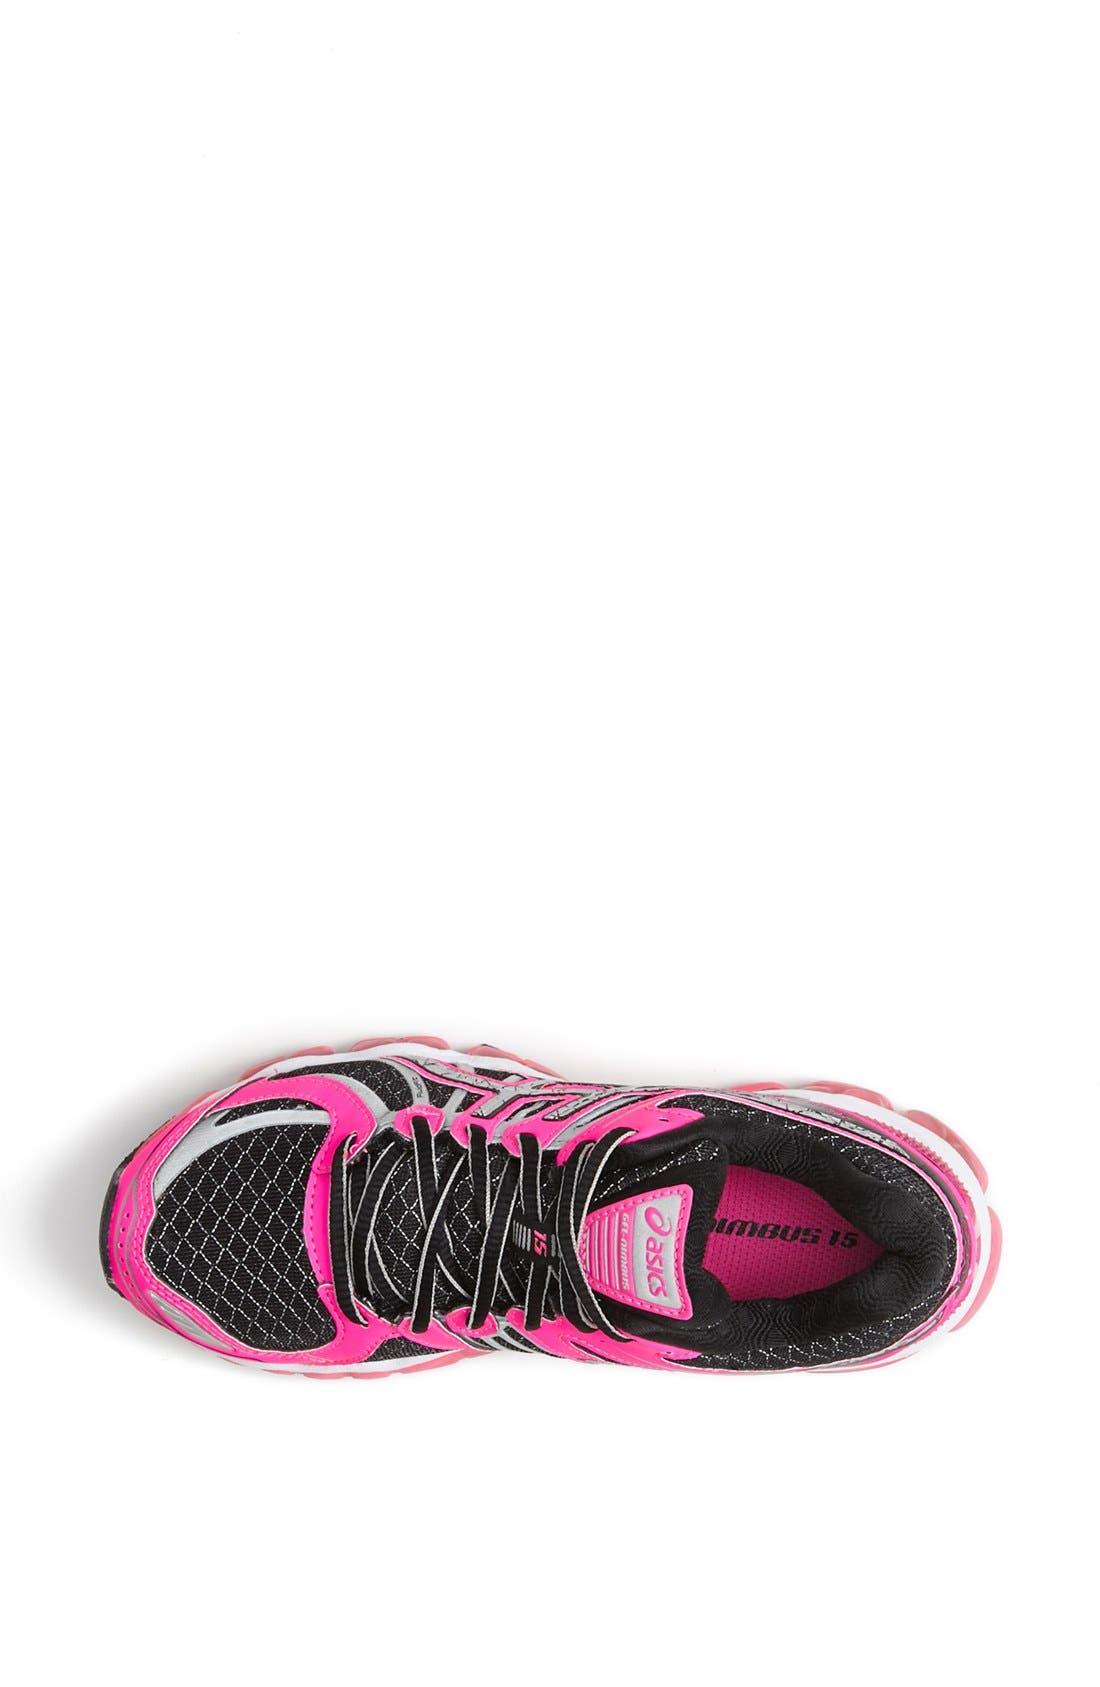 Alternate Image 3  - Asics® 'GEL-Nimbus® 15 Lite' Running Shoe (Women)